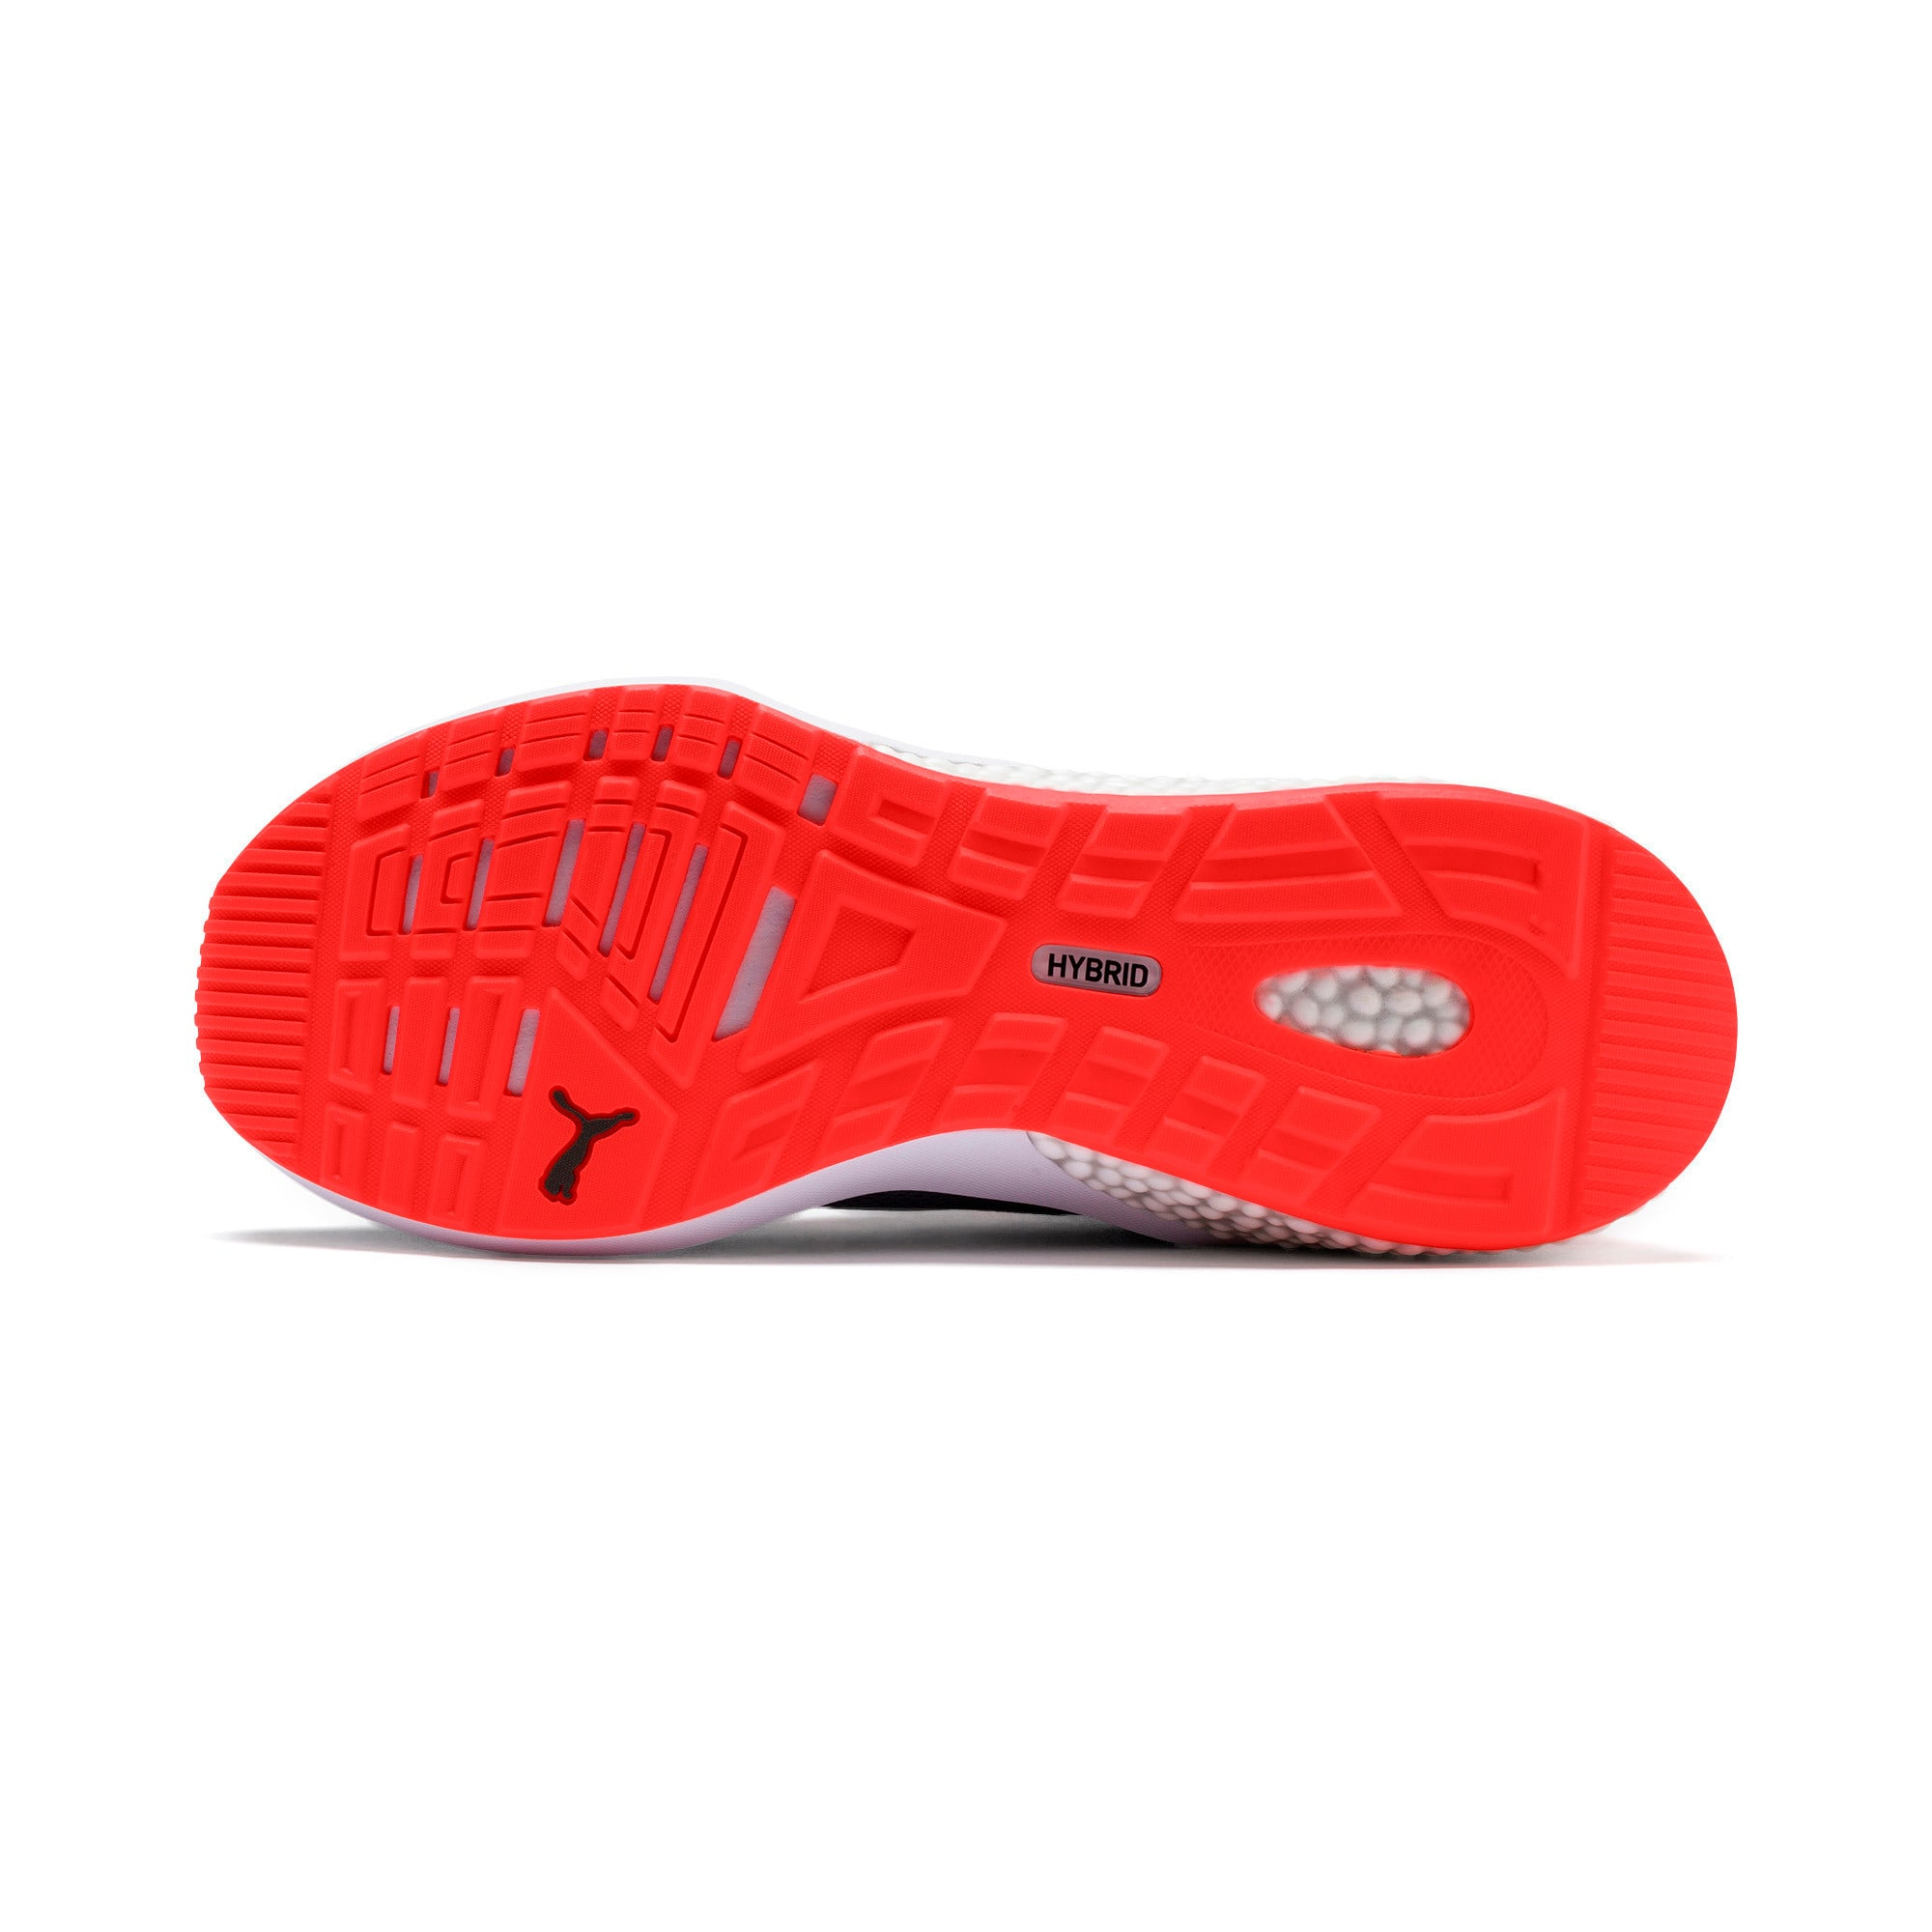 Thumbnail 5 of HYBRID NX Men's Running Shoes, CASTLEROCK-Nrgy Red, medium